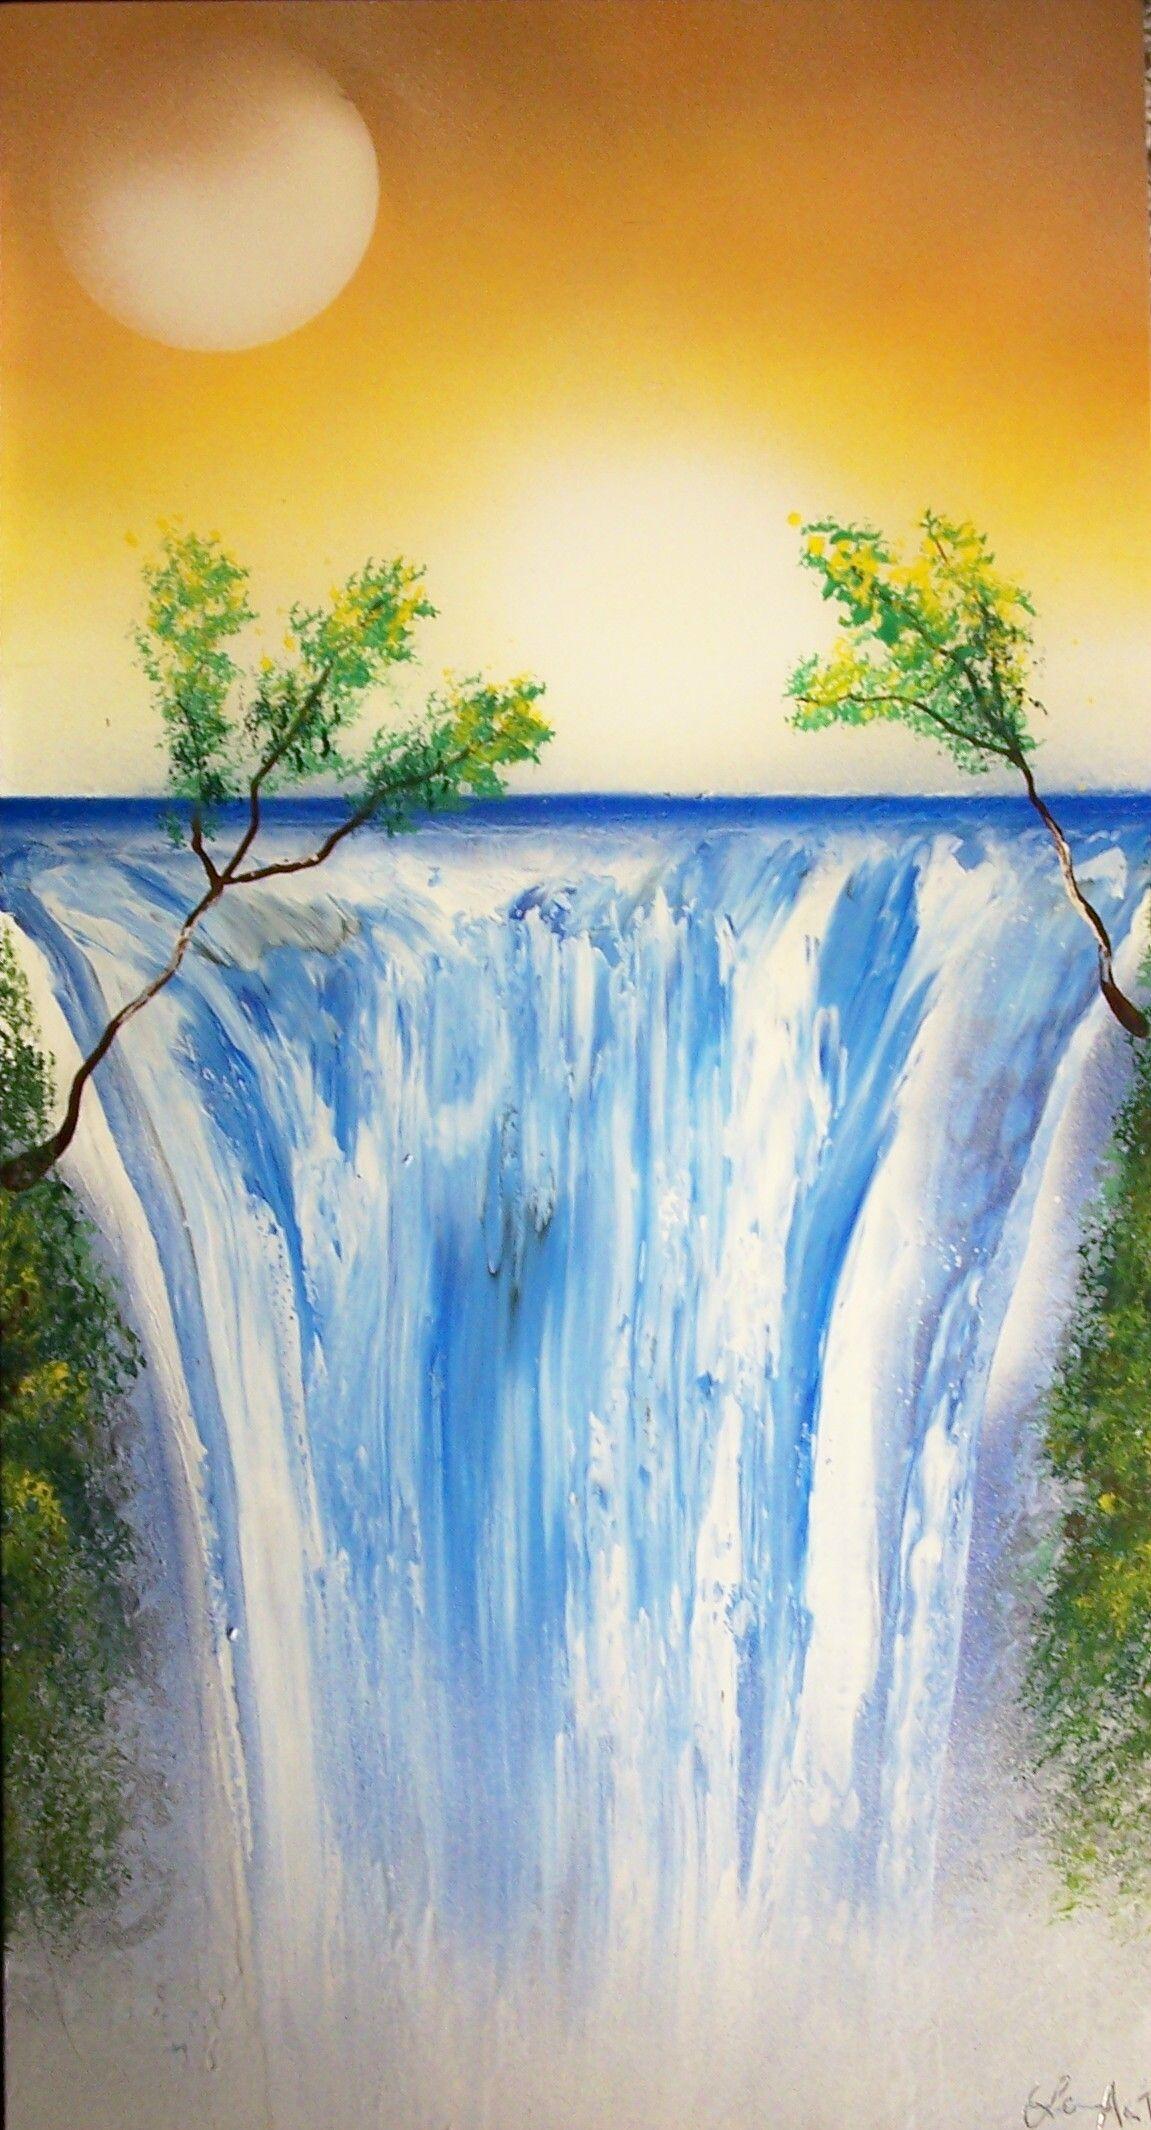 Art By Lenart Spray Paint On Glass Spray Paint Art Waterfall Paintings Art Painting